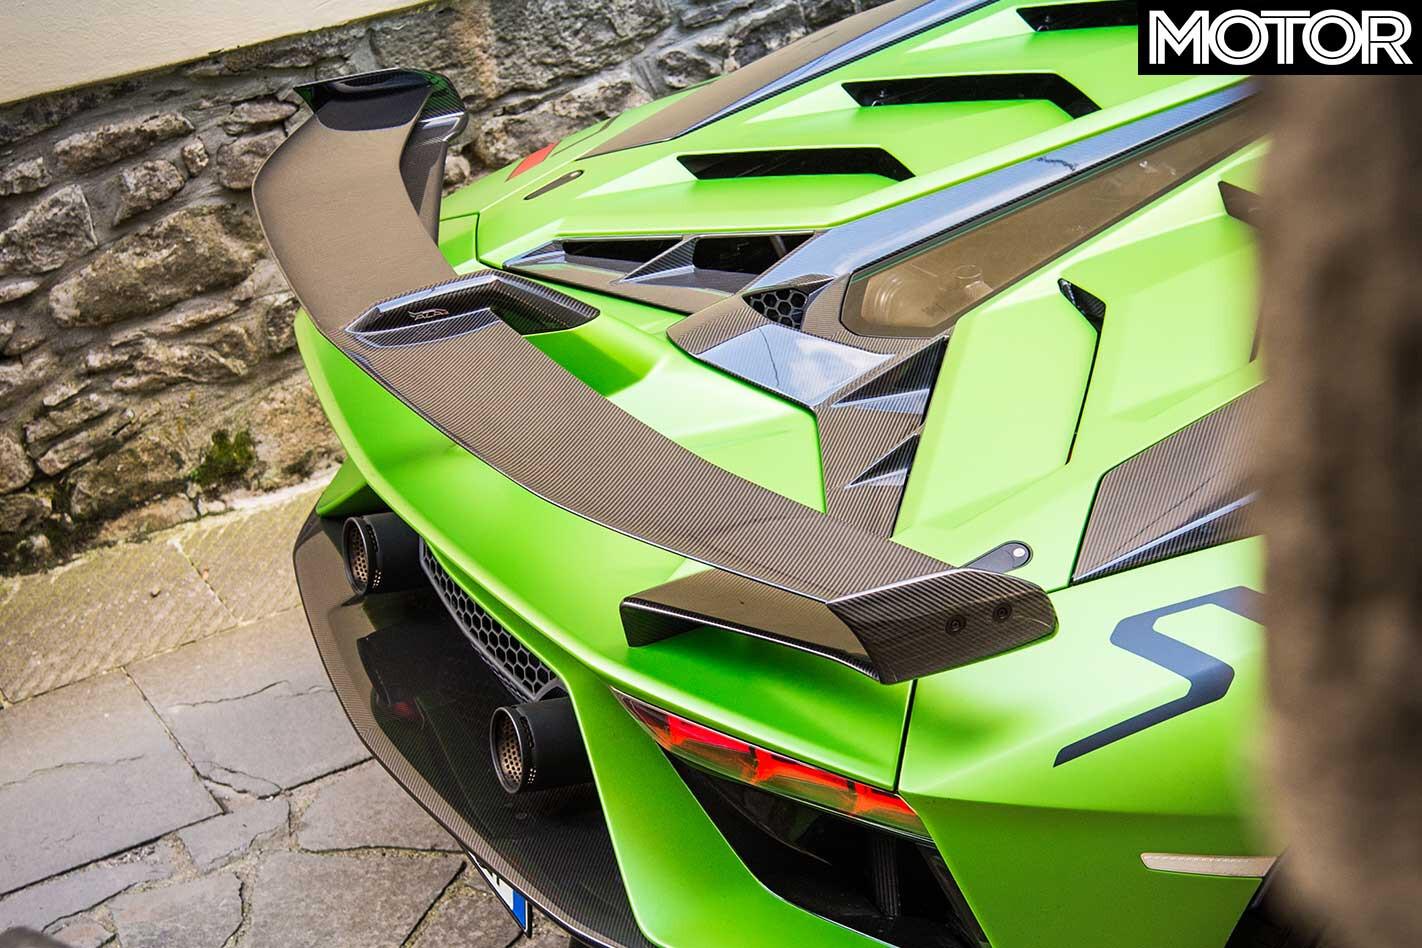 2019 Lamborghini Aventador SVJ Active Aero Rear Wing Jpg